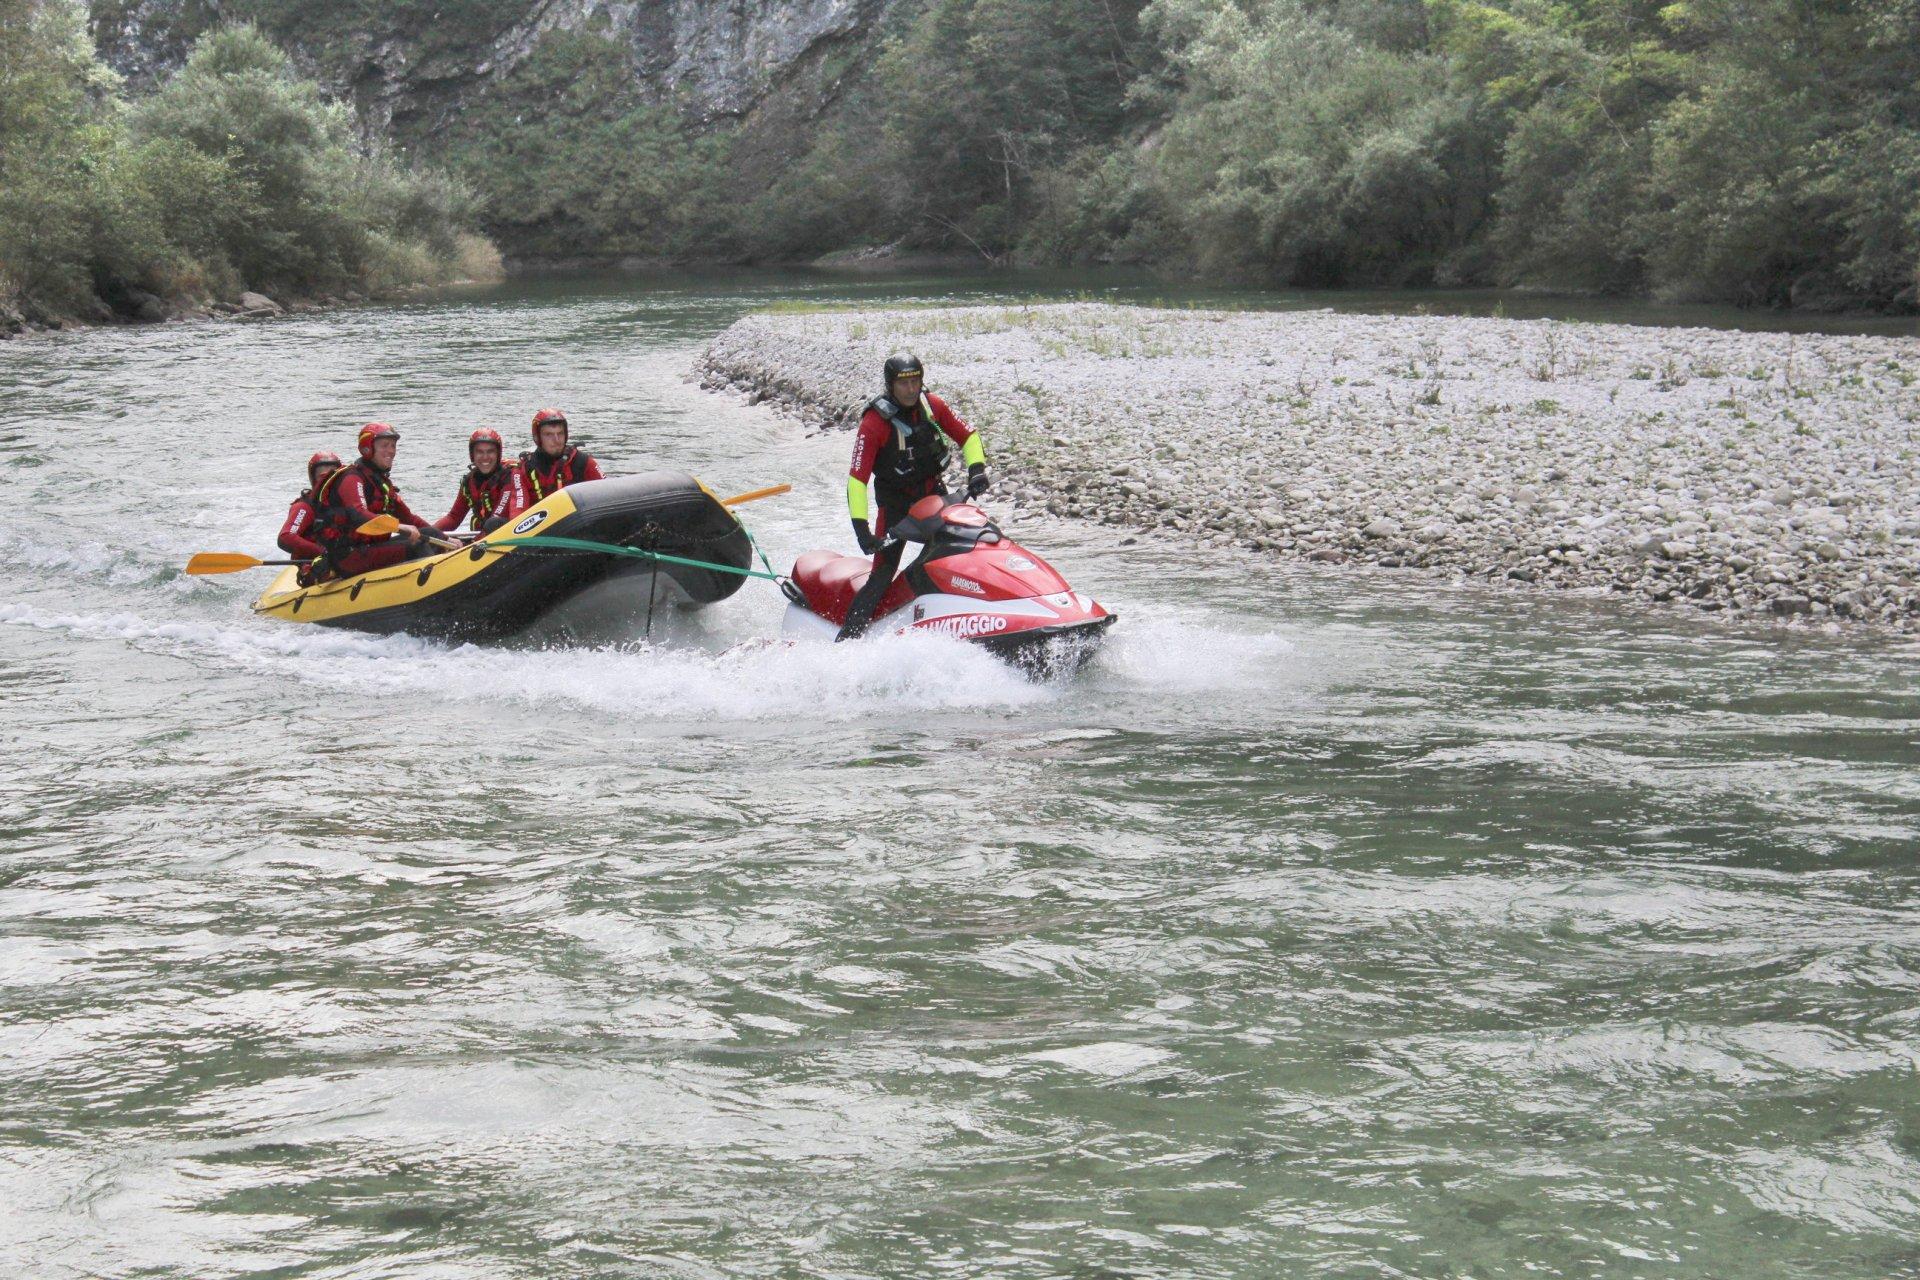 Corso ATP e Aquabike fluviale da soccorso